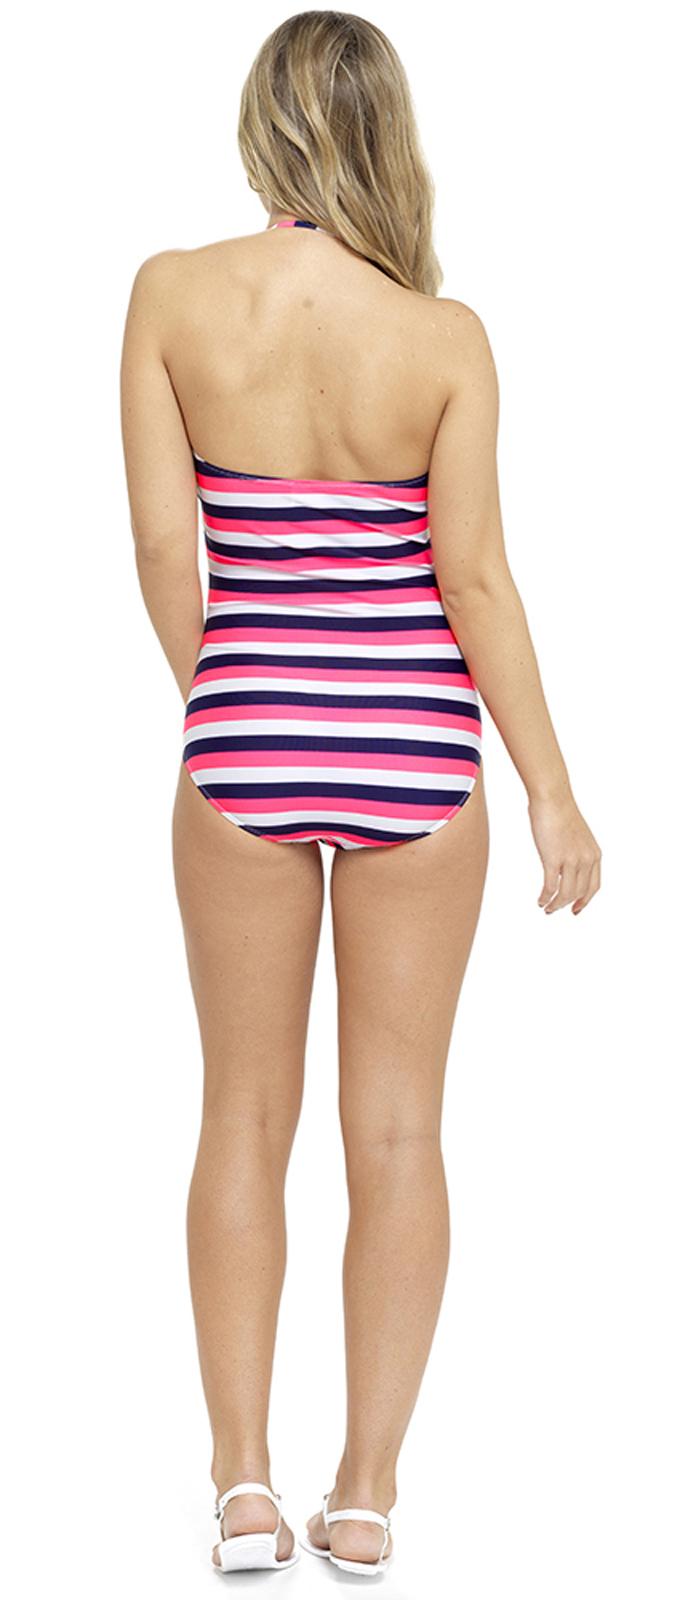 da644f1808b Womens Striped Swimming Costume Multi Way Bandeau / Halterneck ...